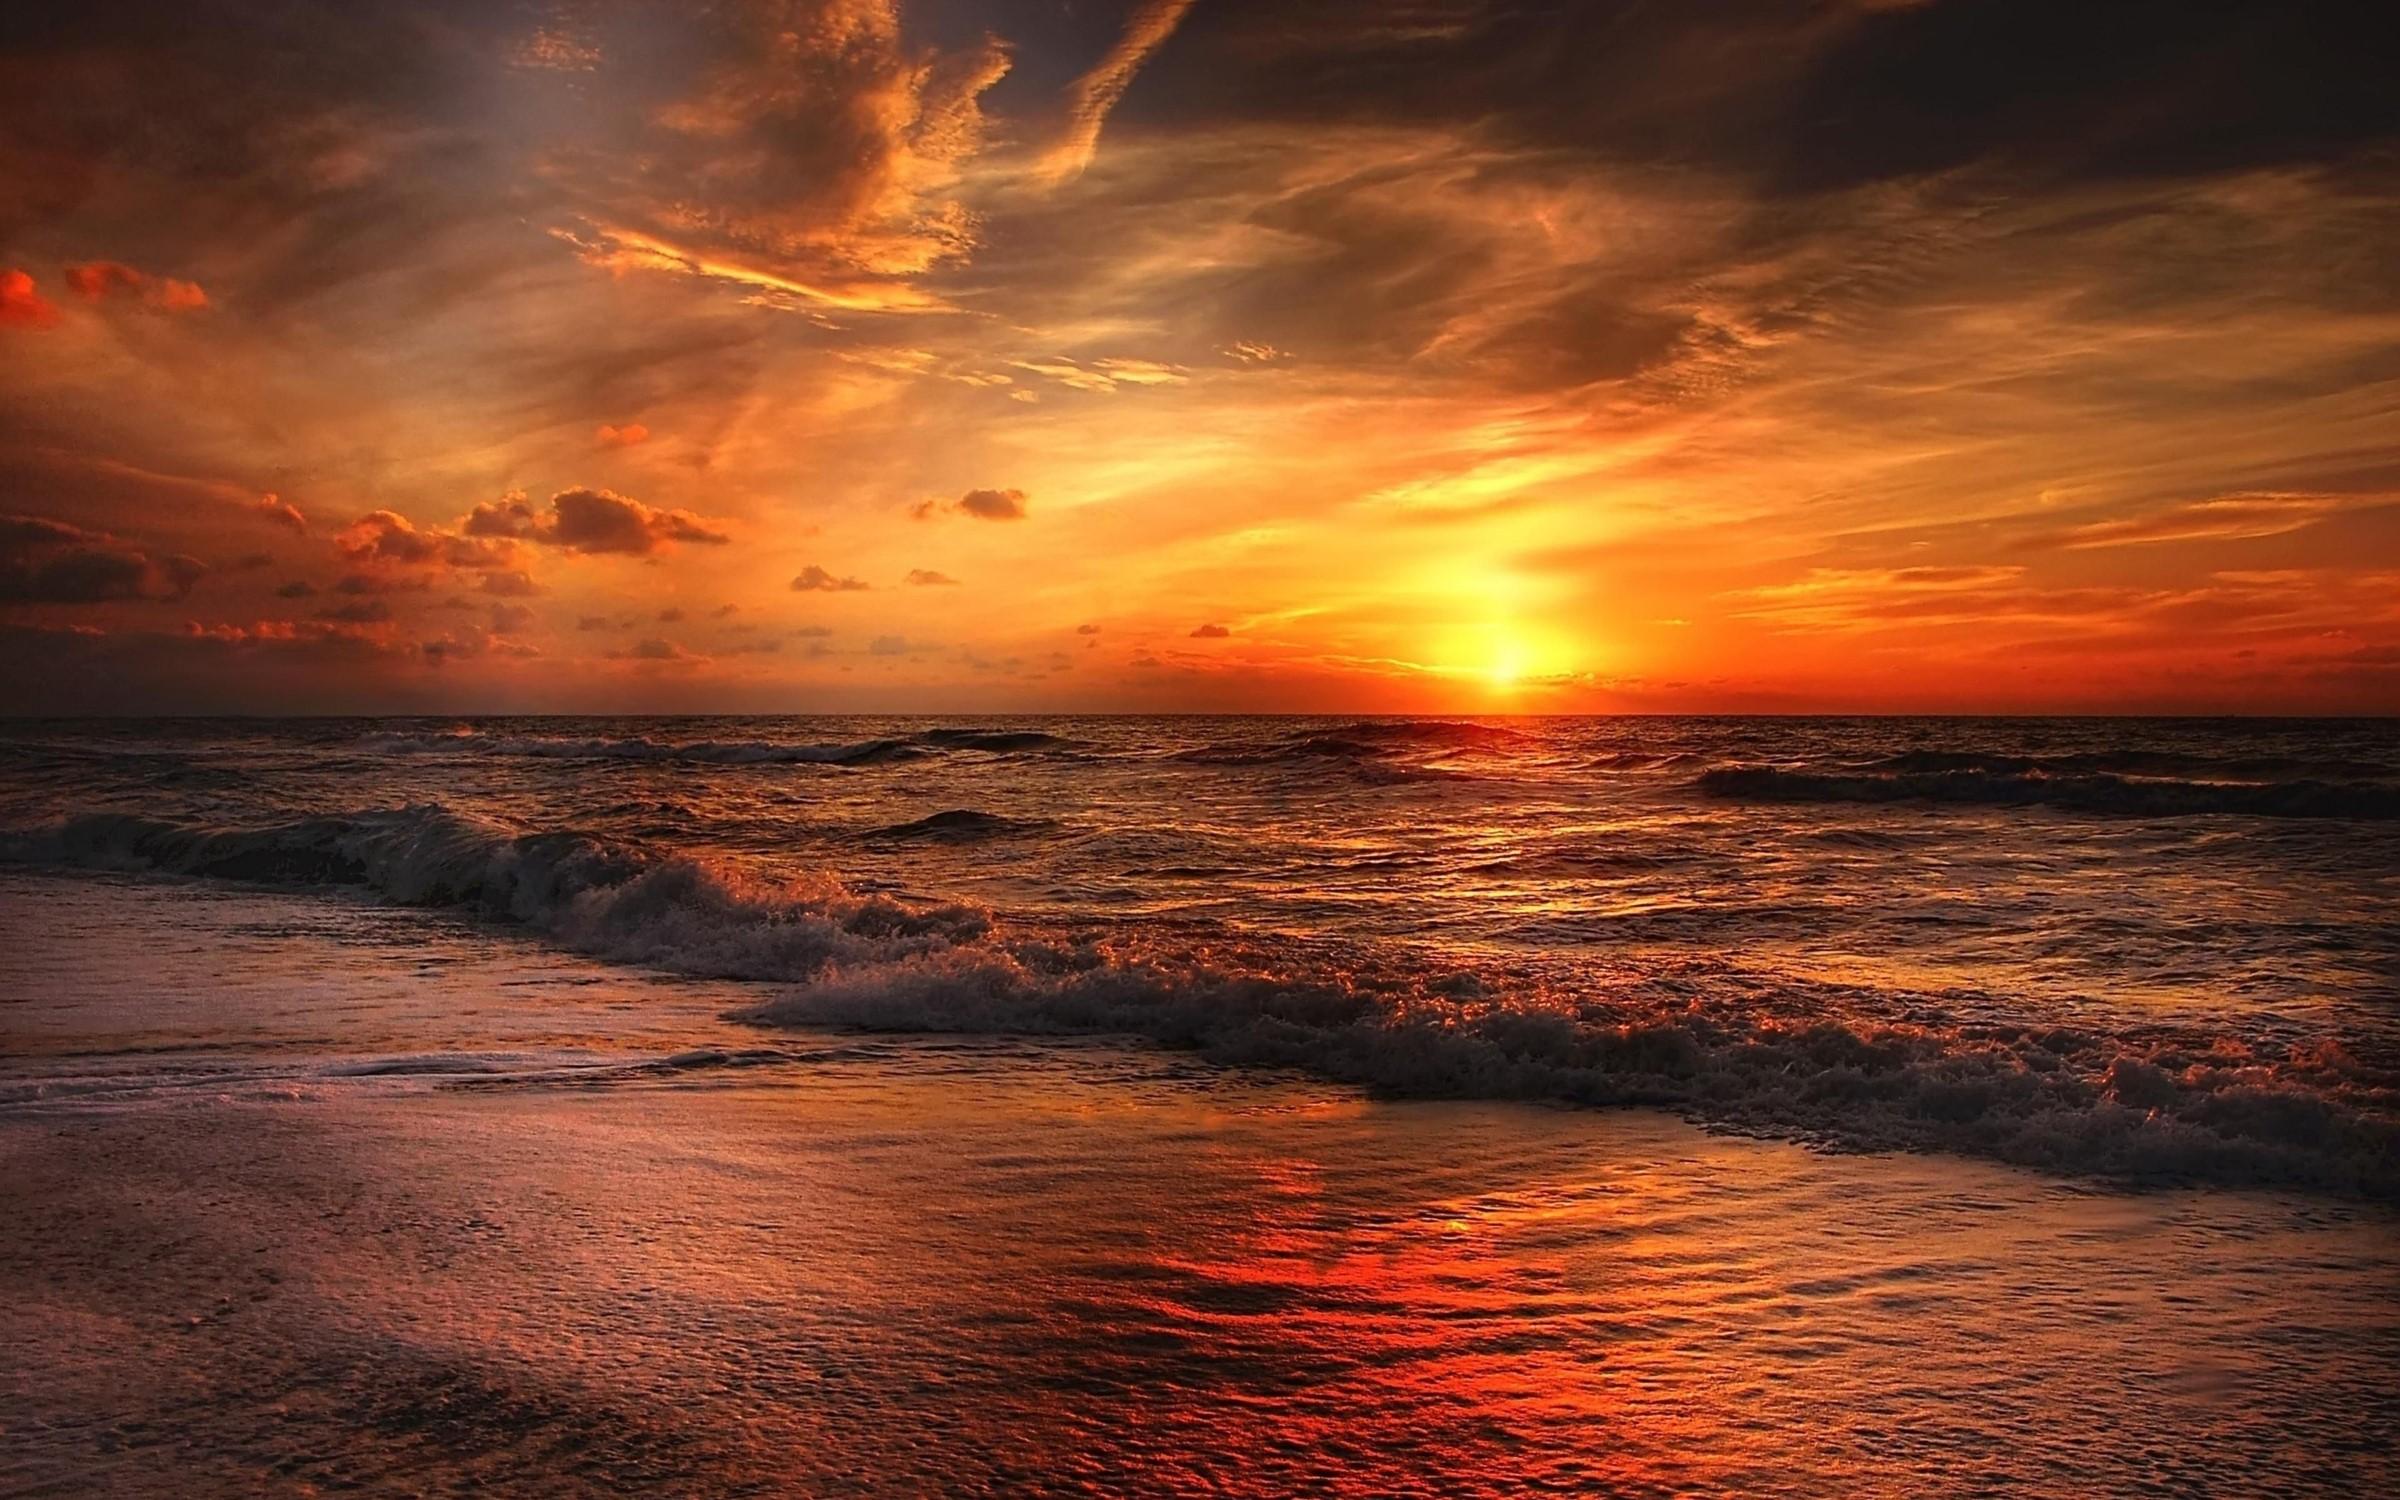 North Sea sunset